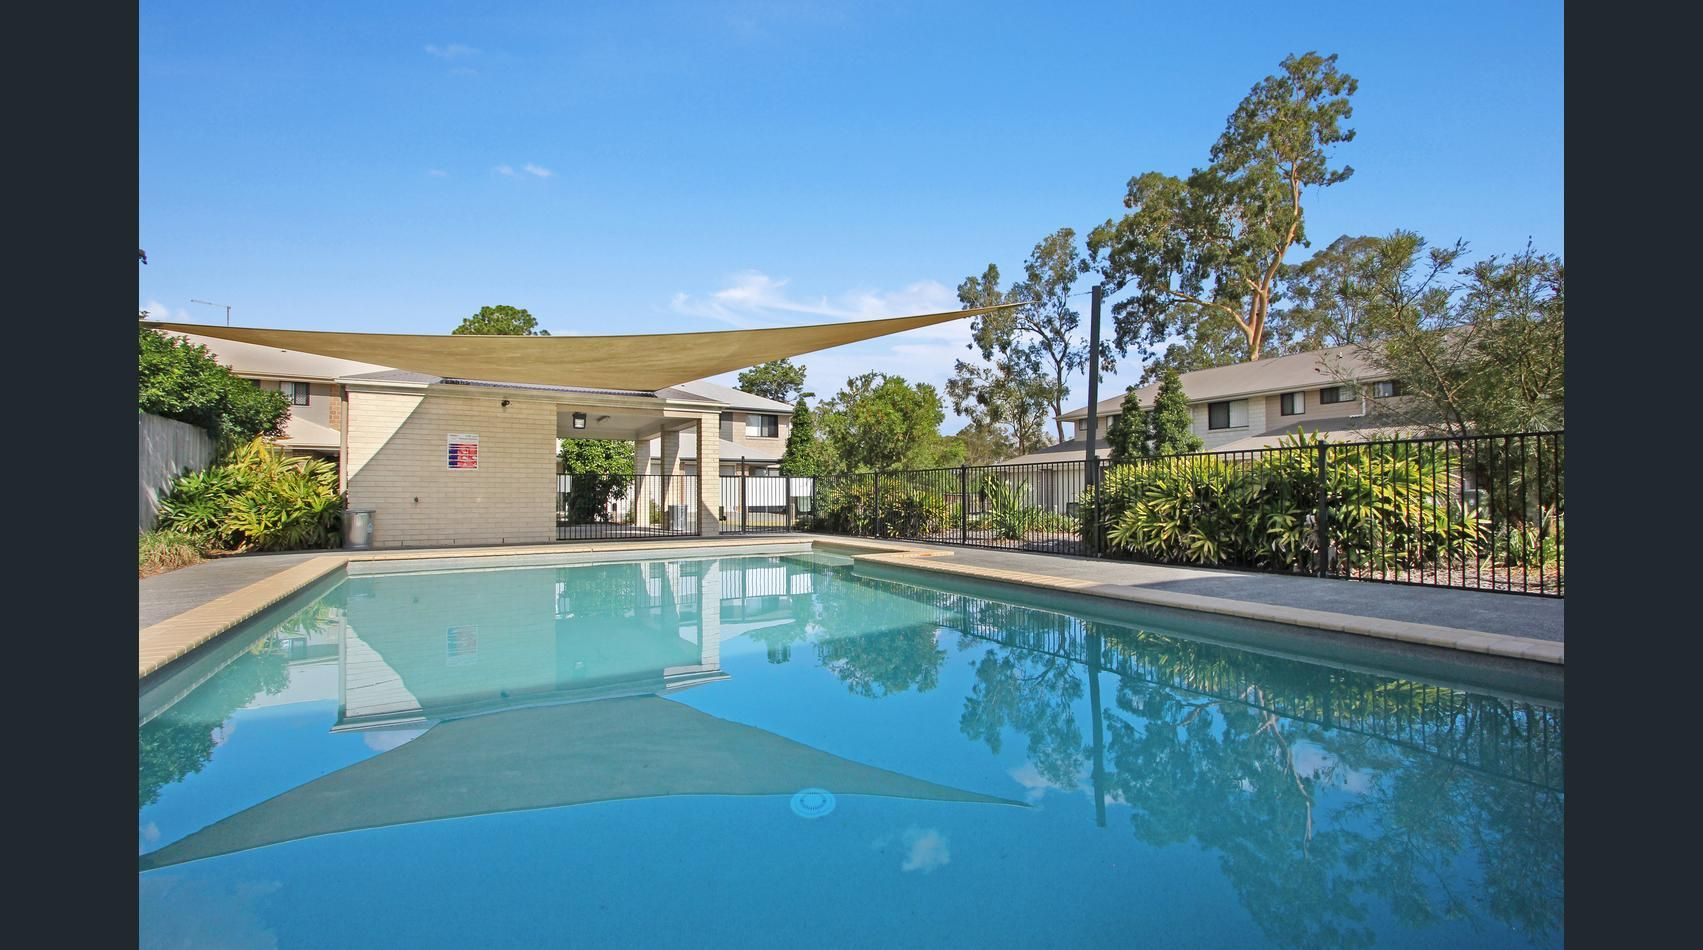 12/44-52 Rockfield Rd, Doolandella QLD 4077, Image 0